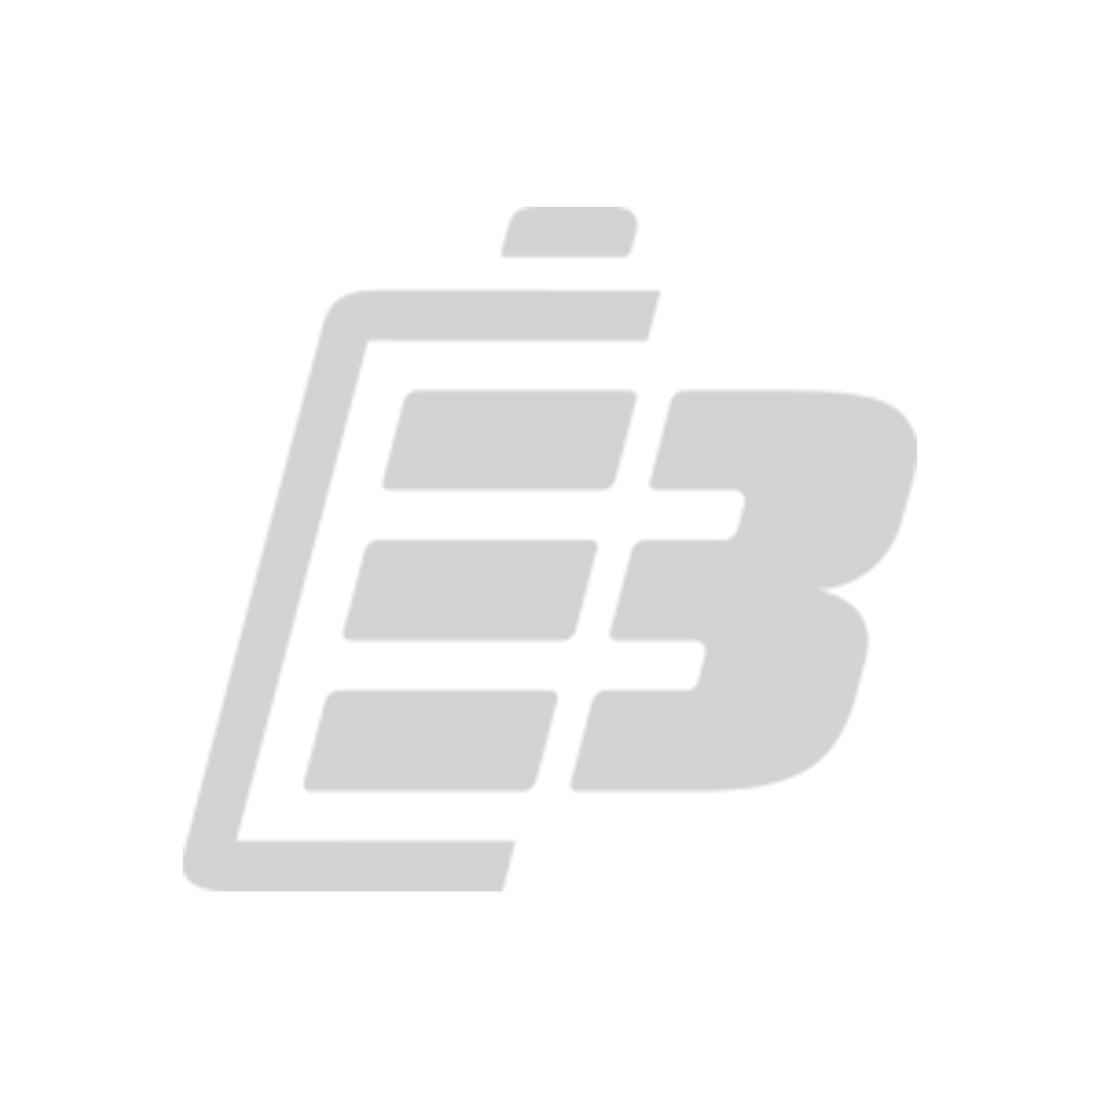 Smartphone battery Apple iPhone 6_1